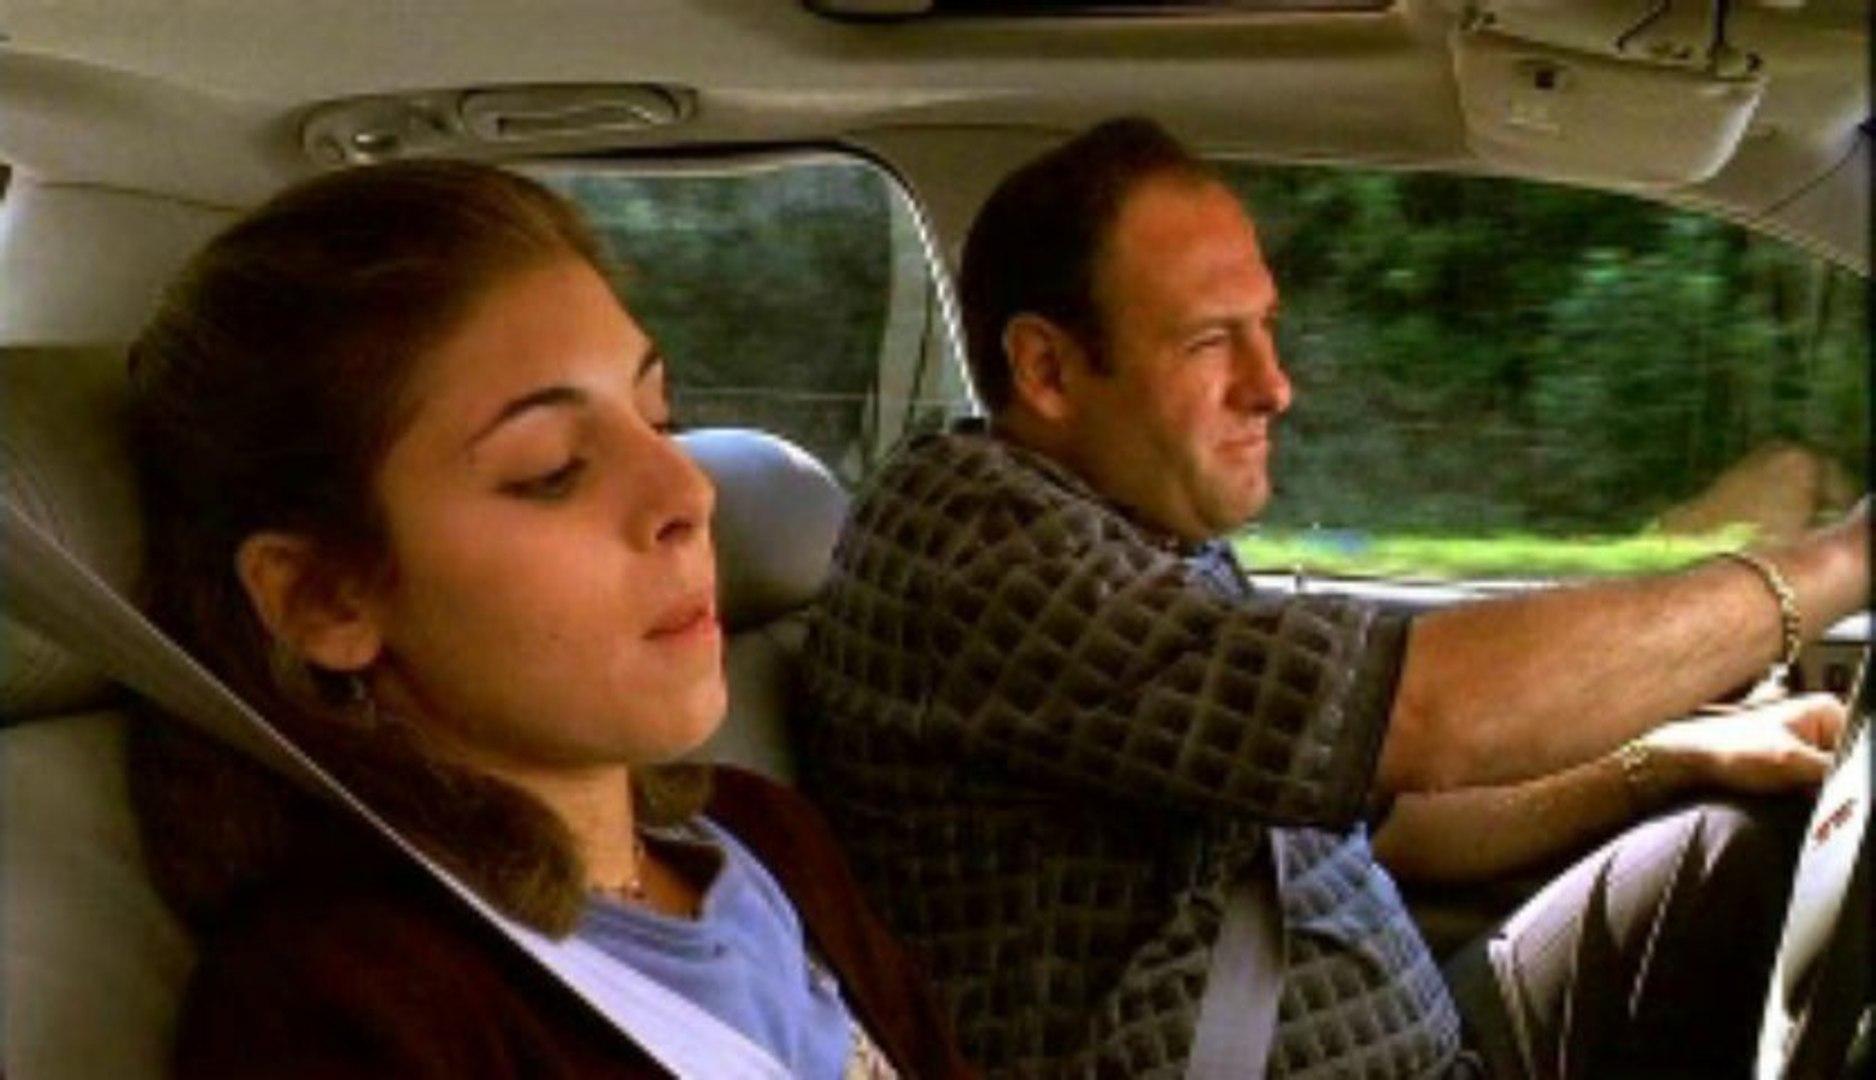 The Sopranos Season 1 Episode 1